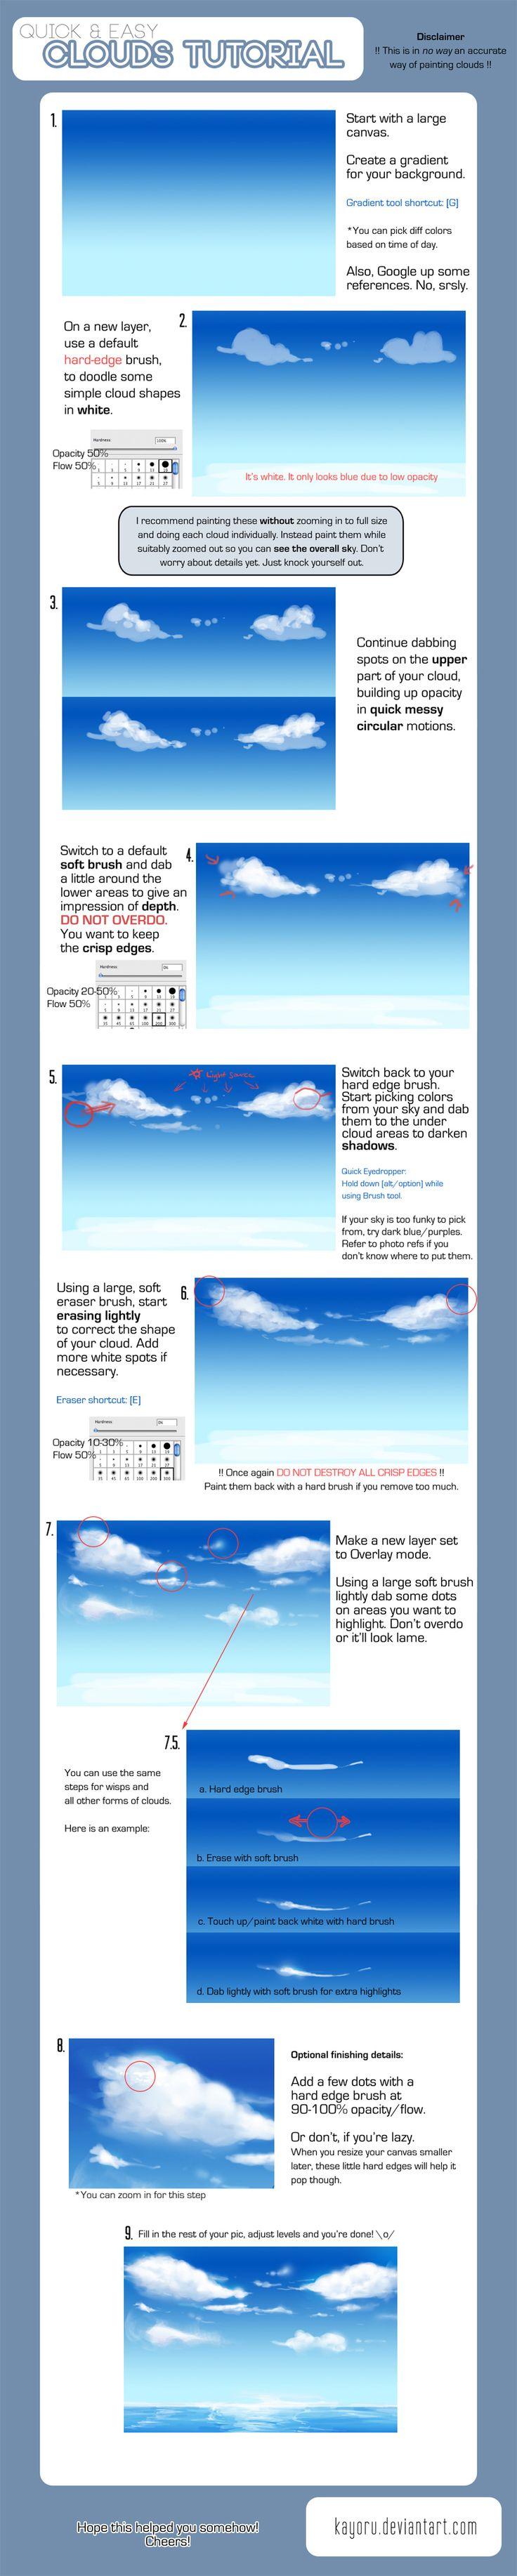 http://fc04.deviantart.net/fs71/f/2012/349/3/b/quick_and_easy_cloud_tutorial_by_kayoru-d5o4912.jpg